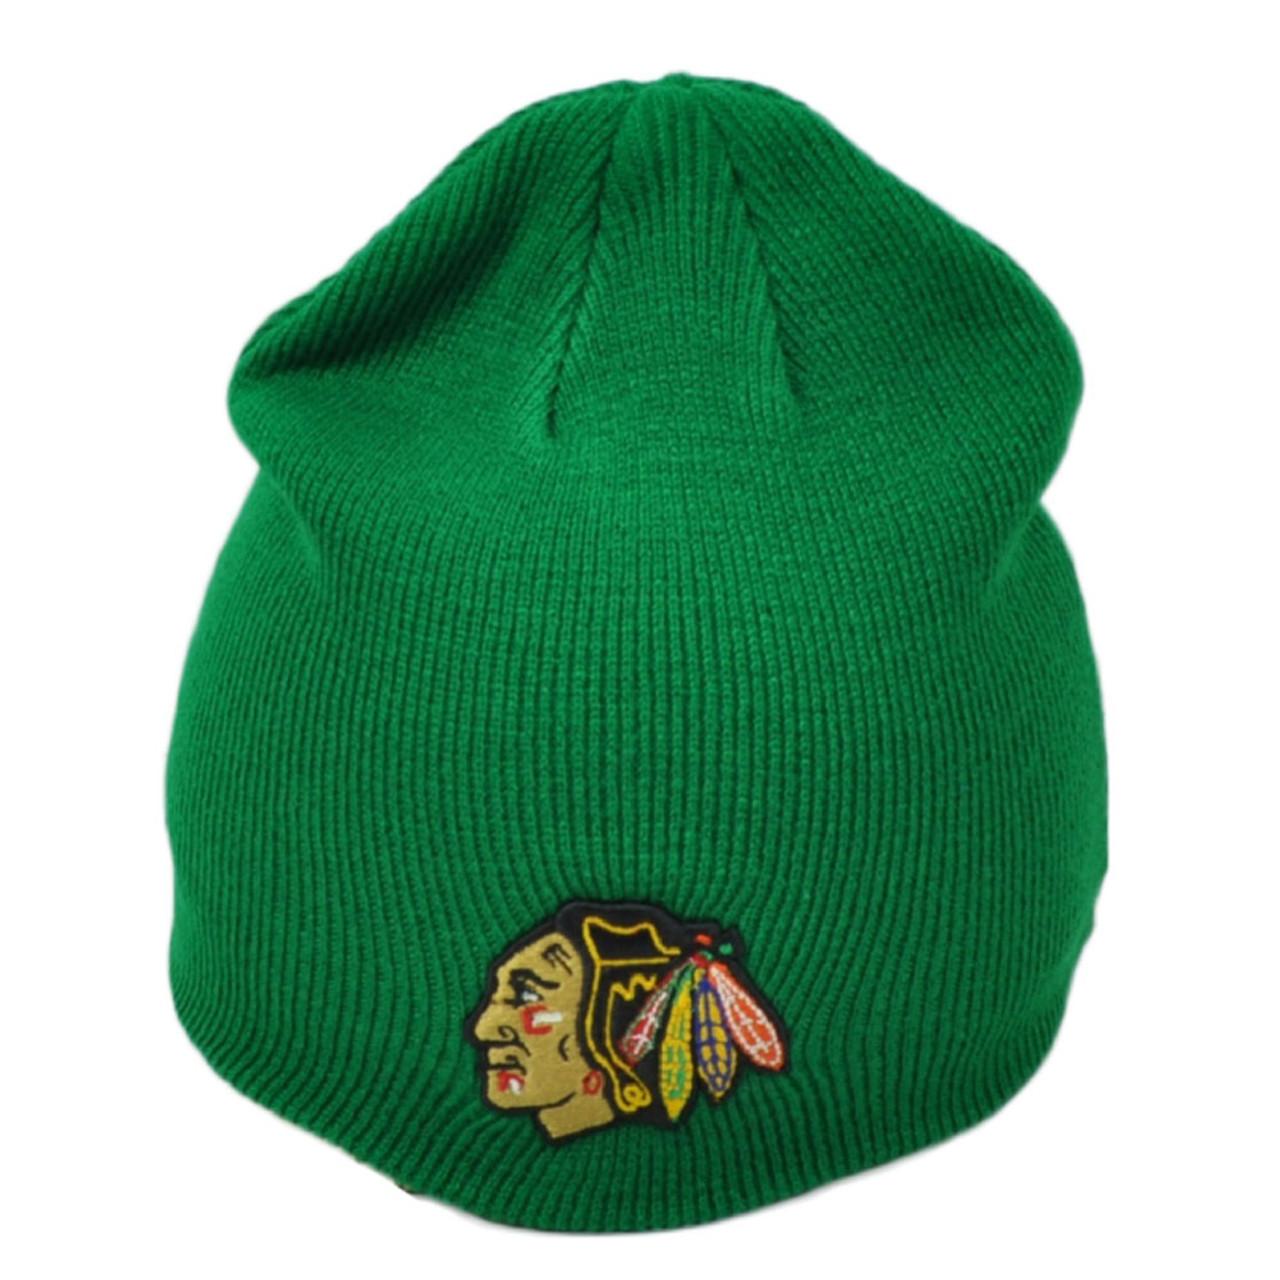 best loved e9b15 508a3 NHL Zephyr Chicago Blackhawks Green Knit Beanie Cuffless Hat Skully Toque